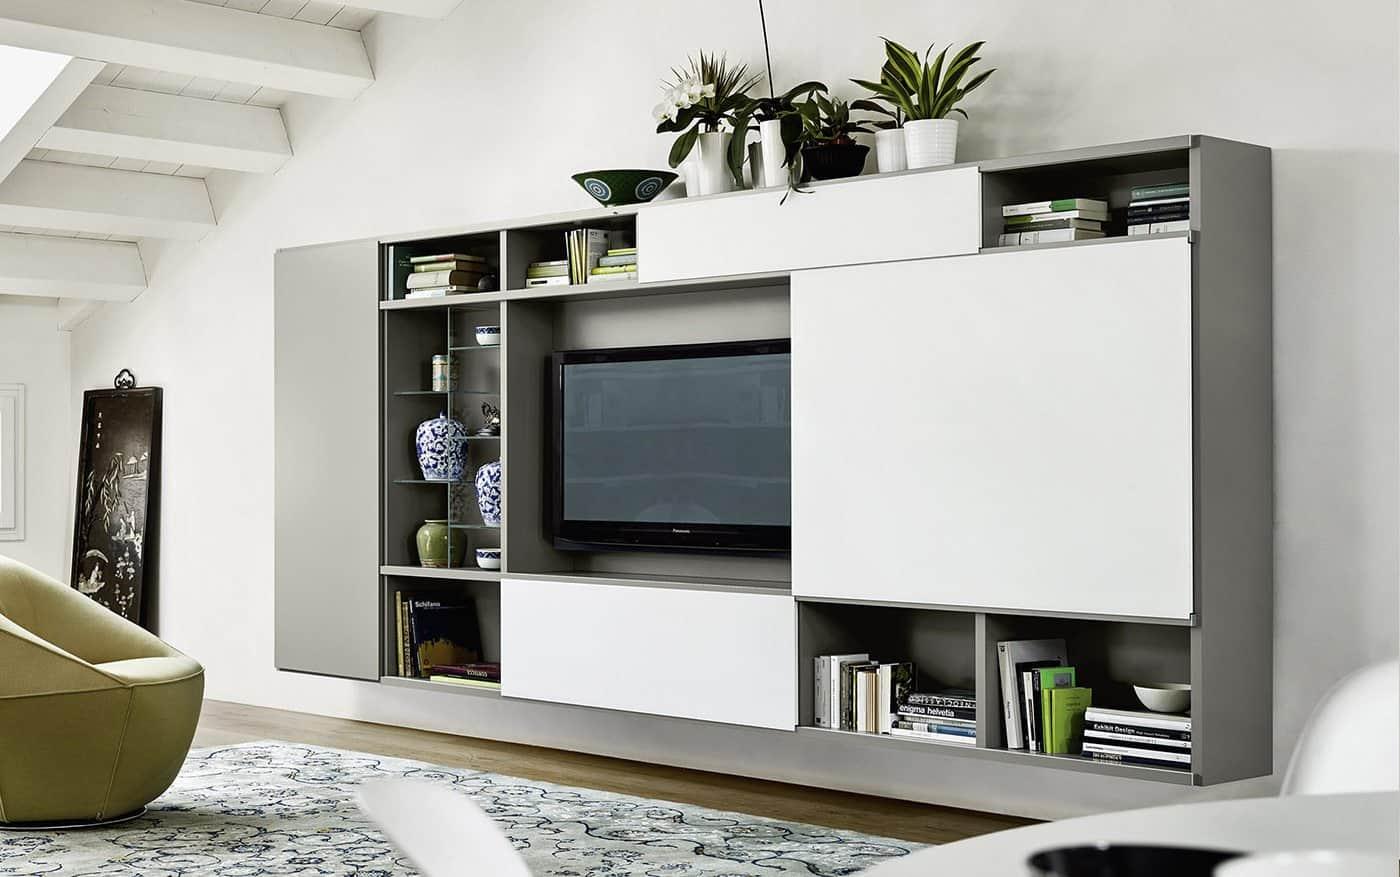 modo wohnwandsysteme san giacomo online kaufen wohnstation. Black Bedroom Furniture Sets. Home Design Ideas